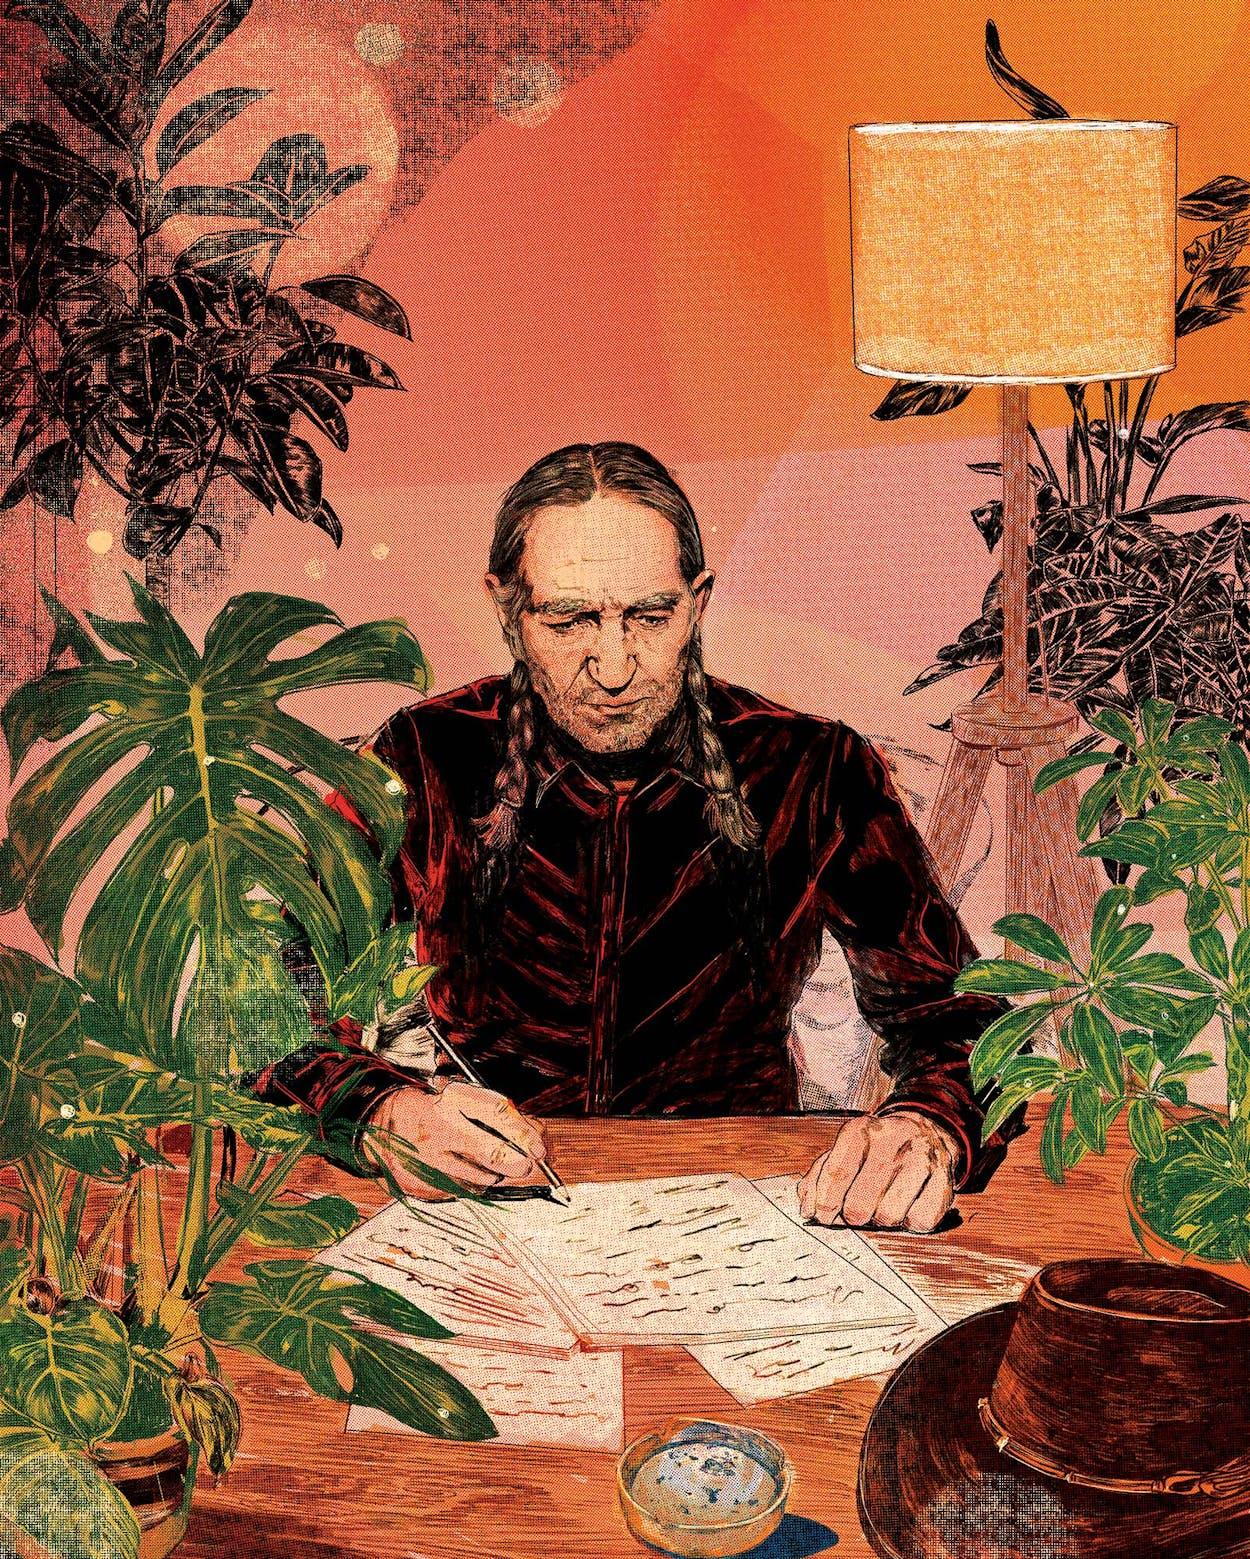 willie-nelson-songwriter-illustration-by-nicole-rifkin